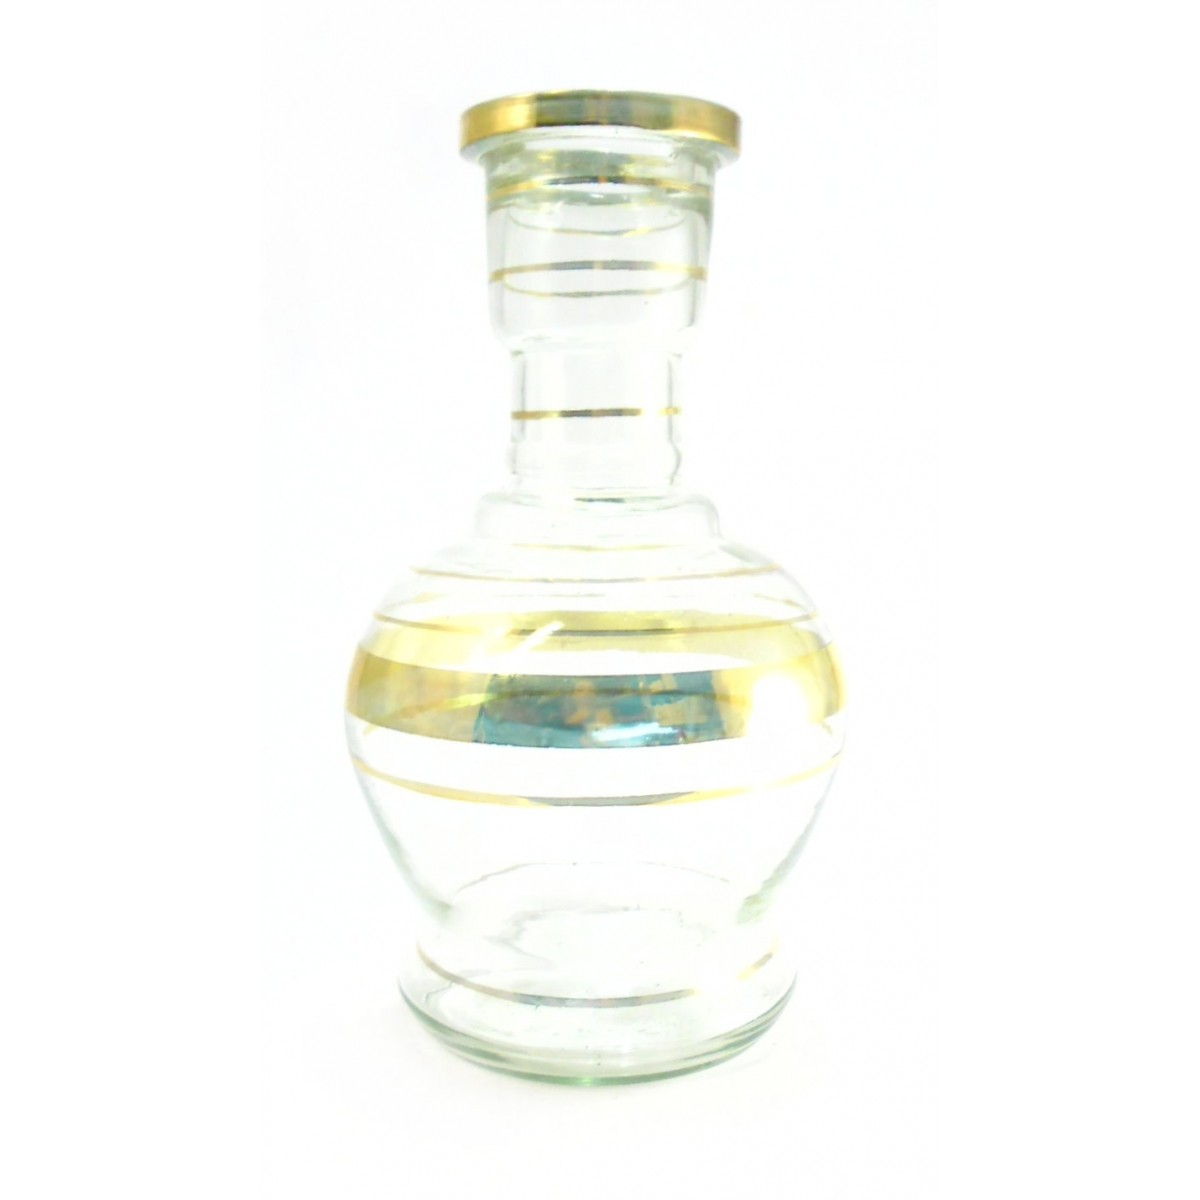 Vaso/base para narguile JUMBO MÉDIO 26cm, artesanal Egípcio transparente c/listra. Bocal 4,6cm diâm.